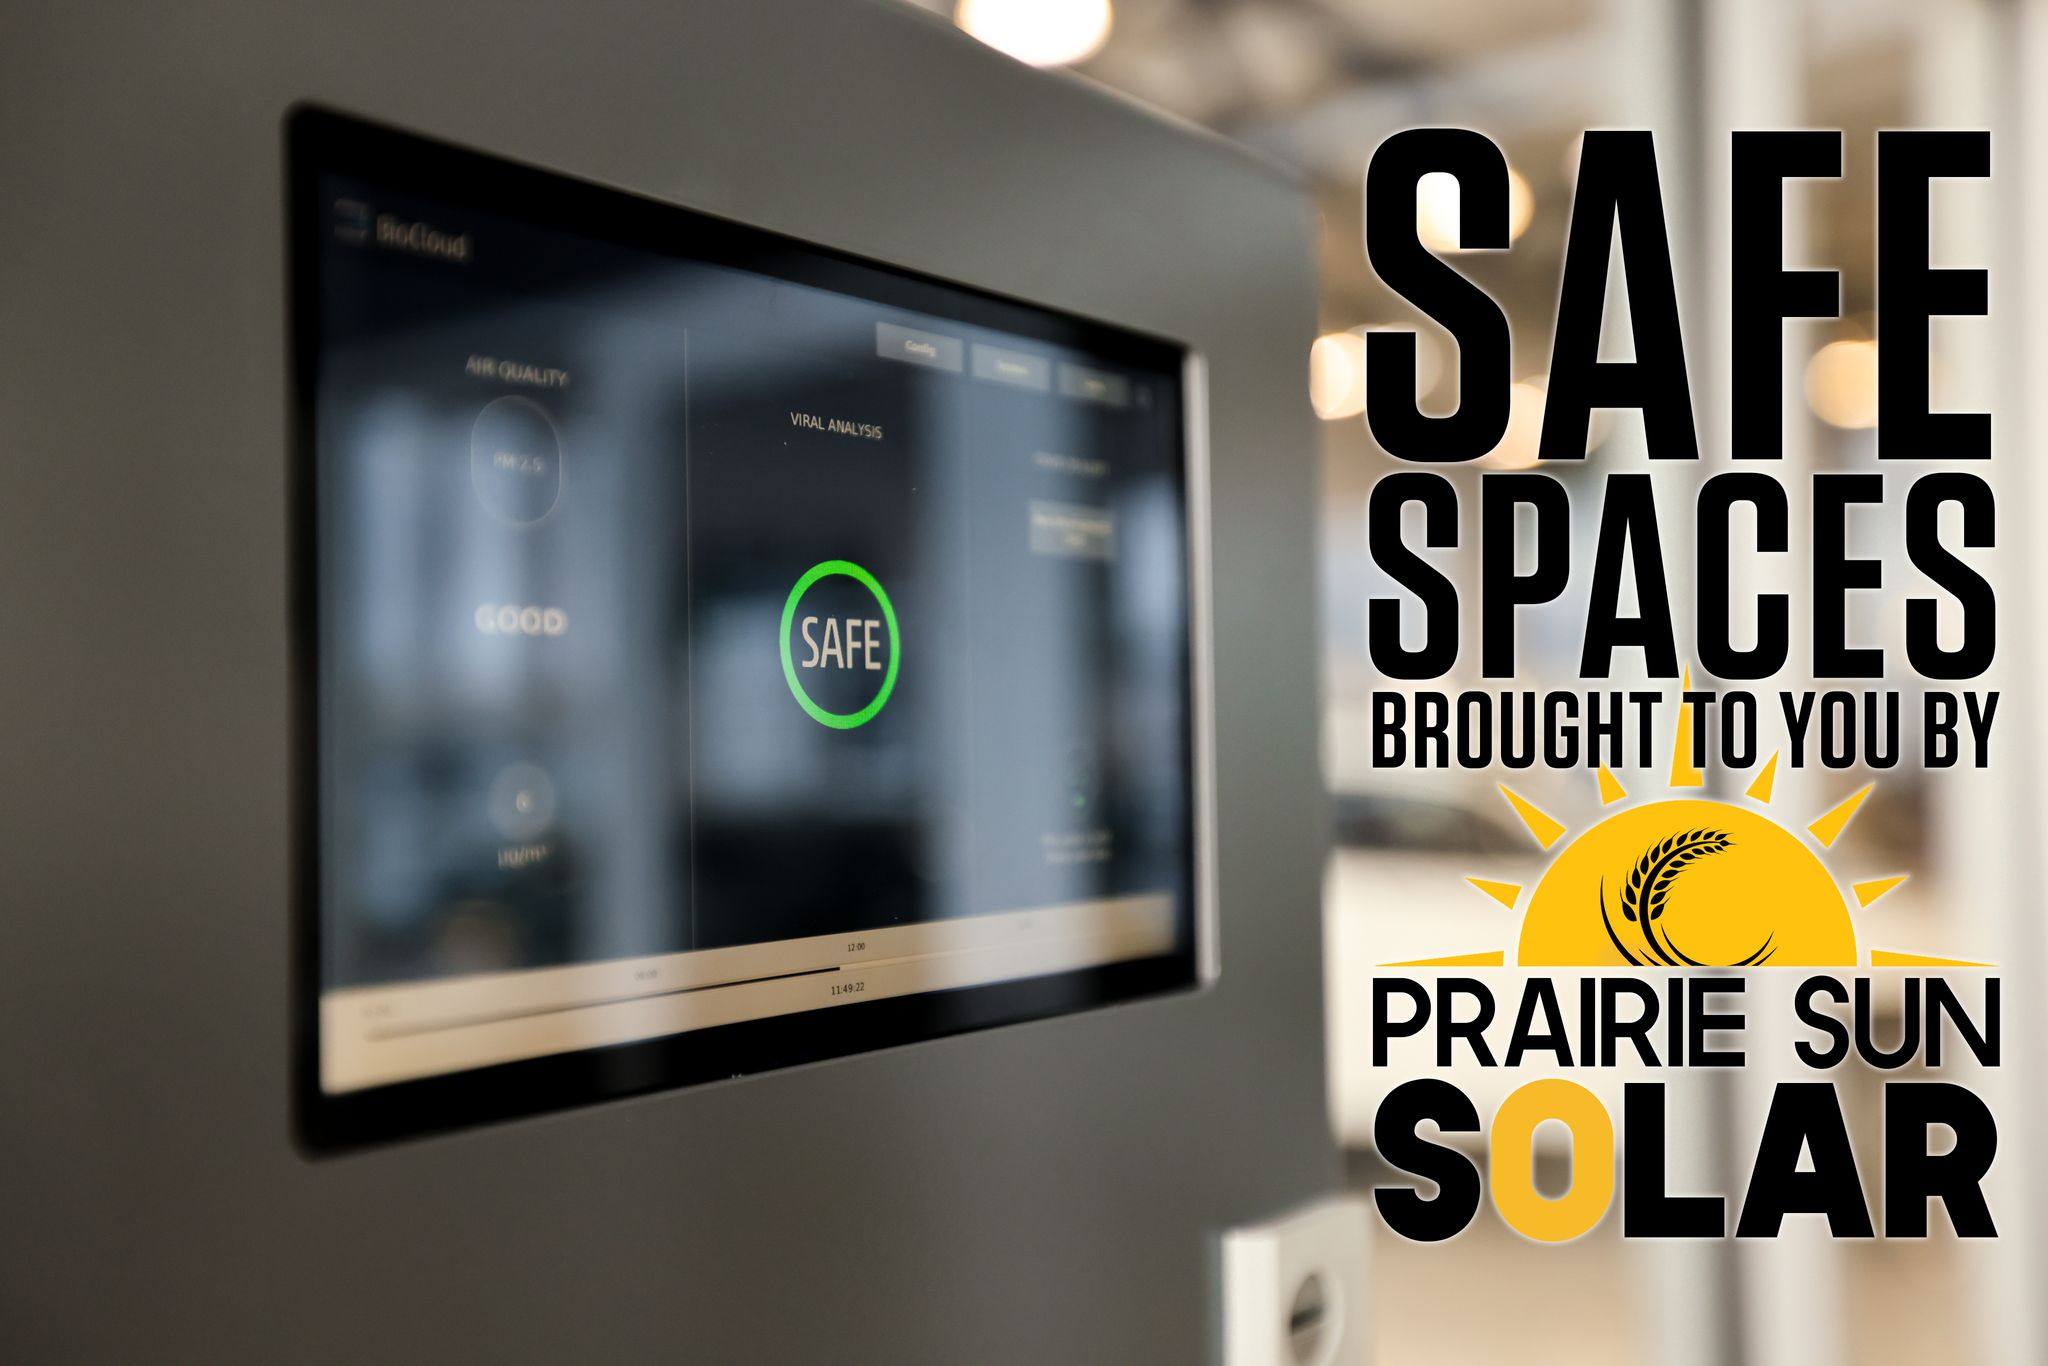 Safe space by praire sun solar